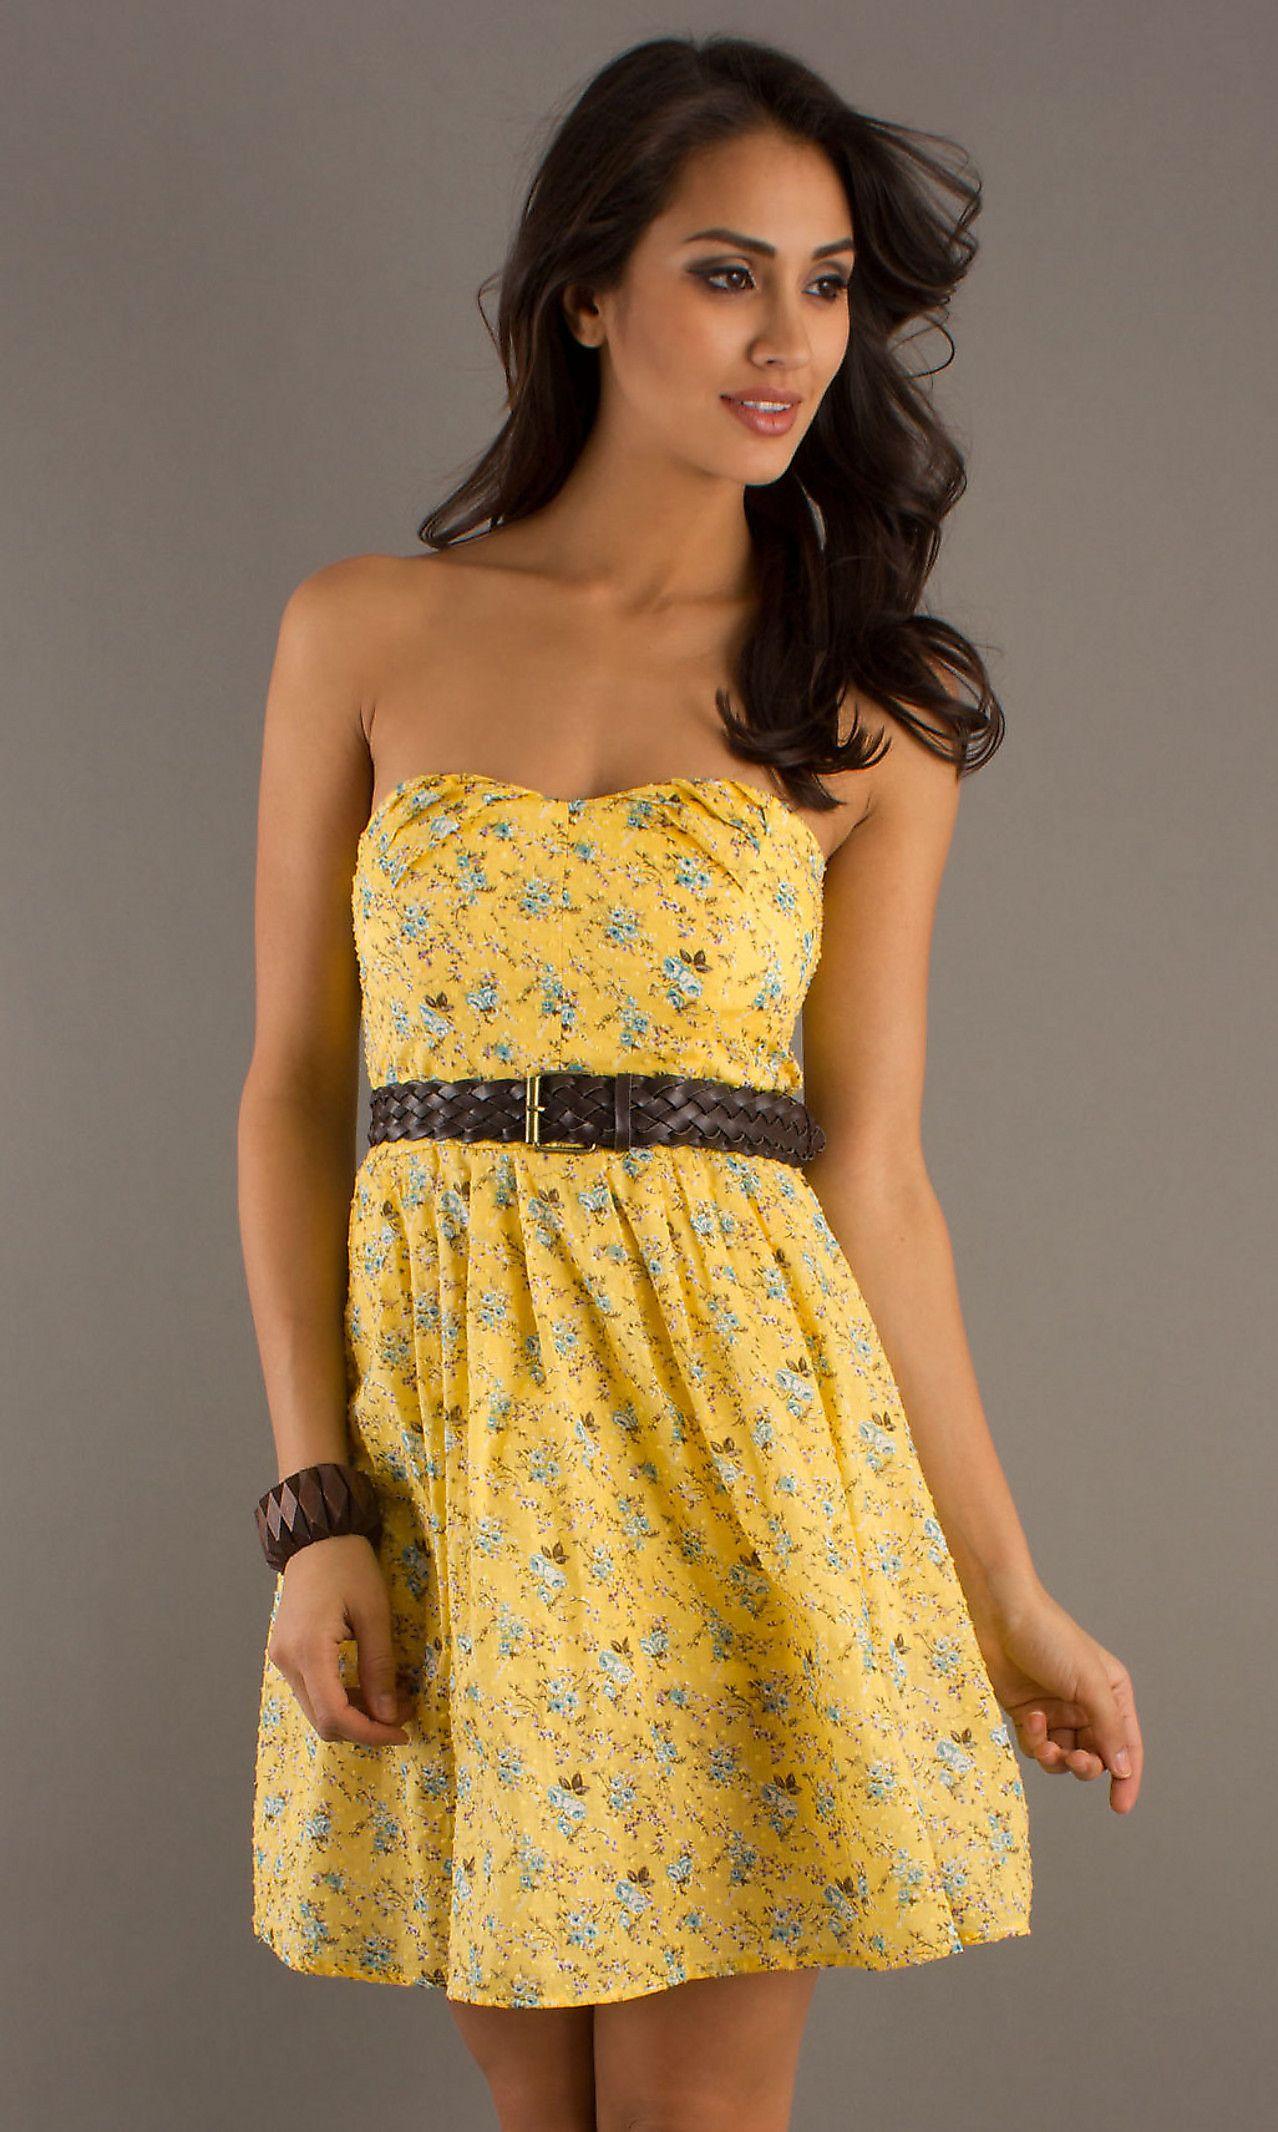 summer dresses for weddings Short Strapless Yellow Summer Dress